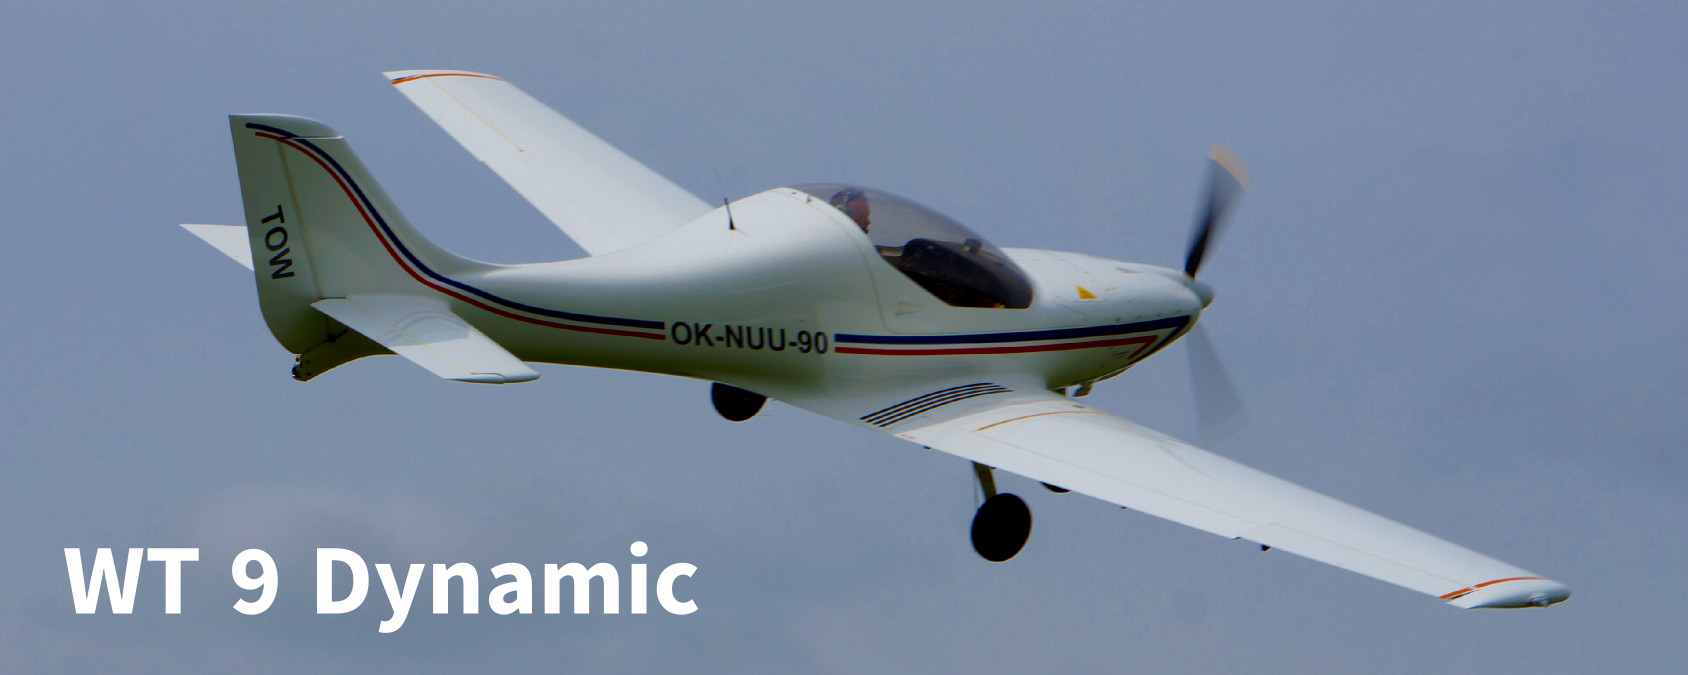 WT-9 Dynamic